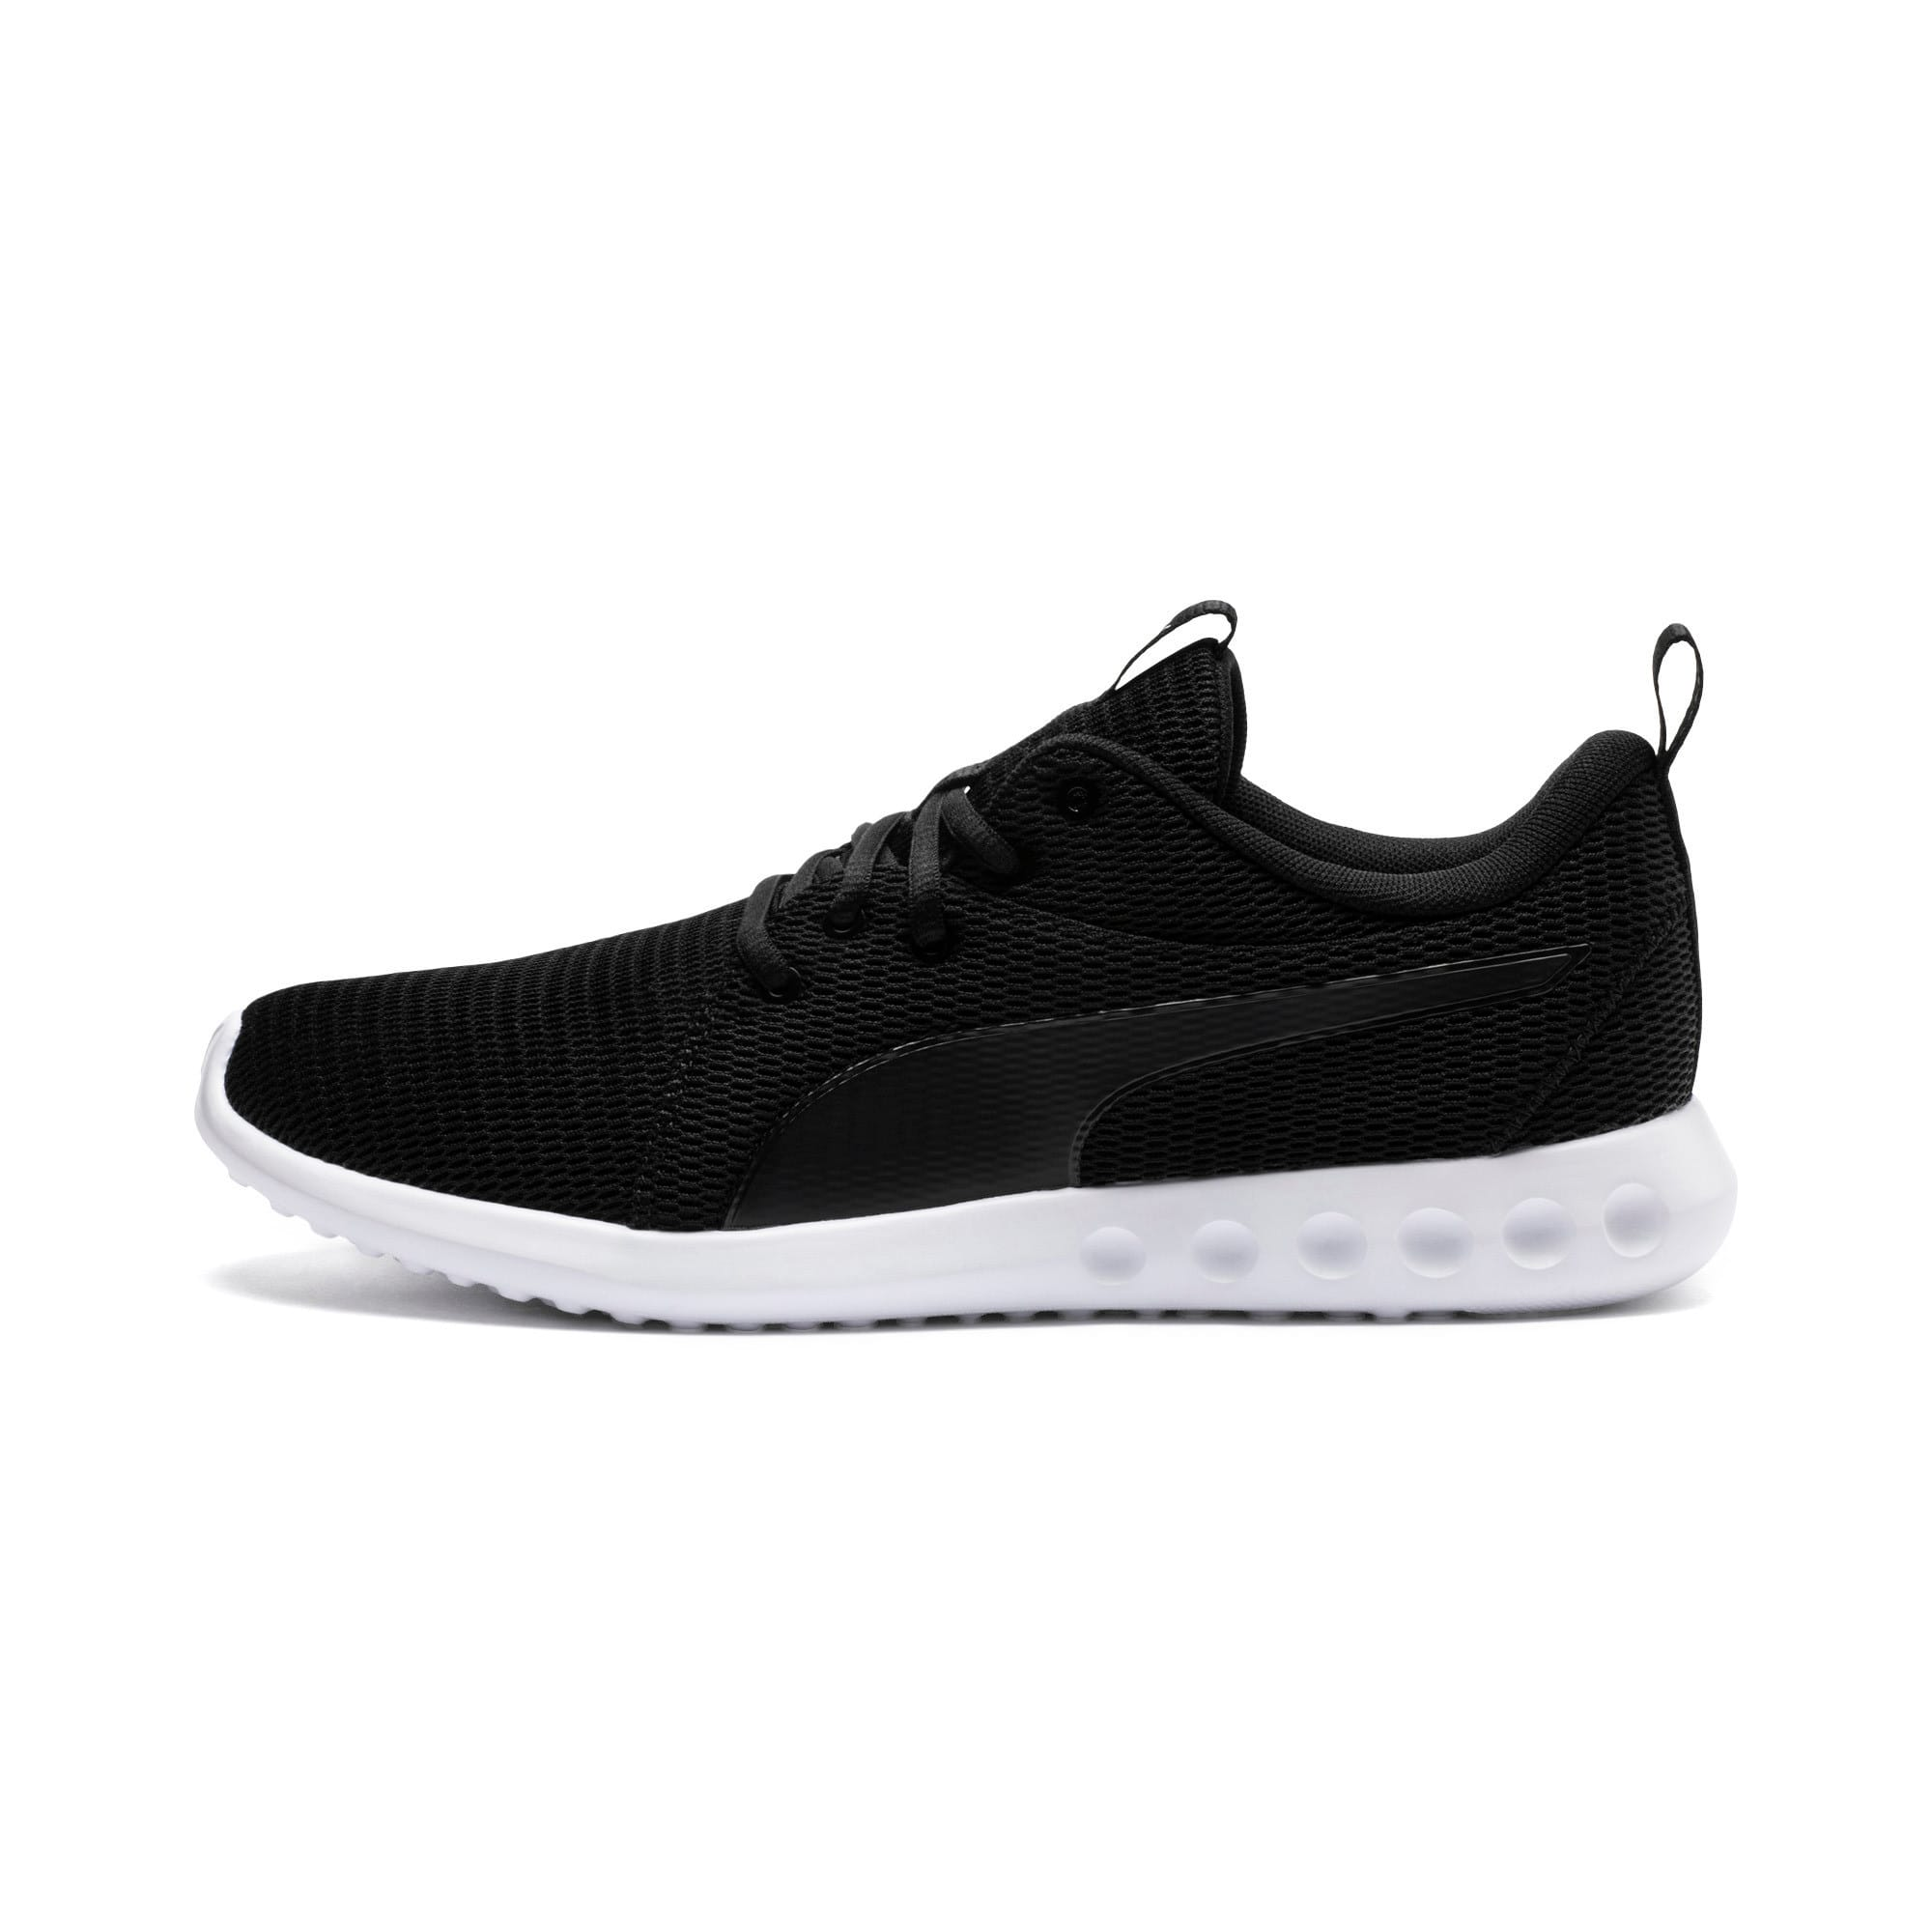 Miniatura 1 de Zapatos para correrCarson 2 New Corepara hombre, Puma Black-Puma White, mediano